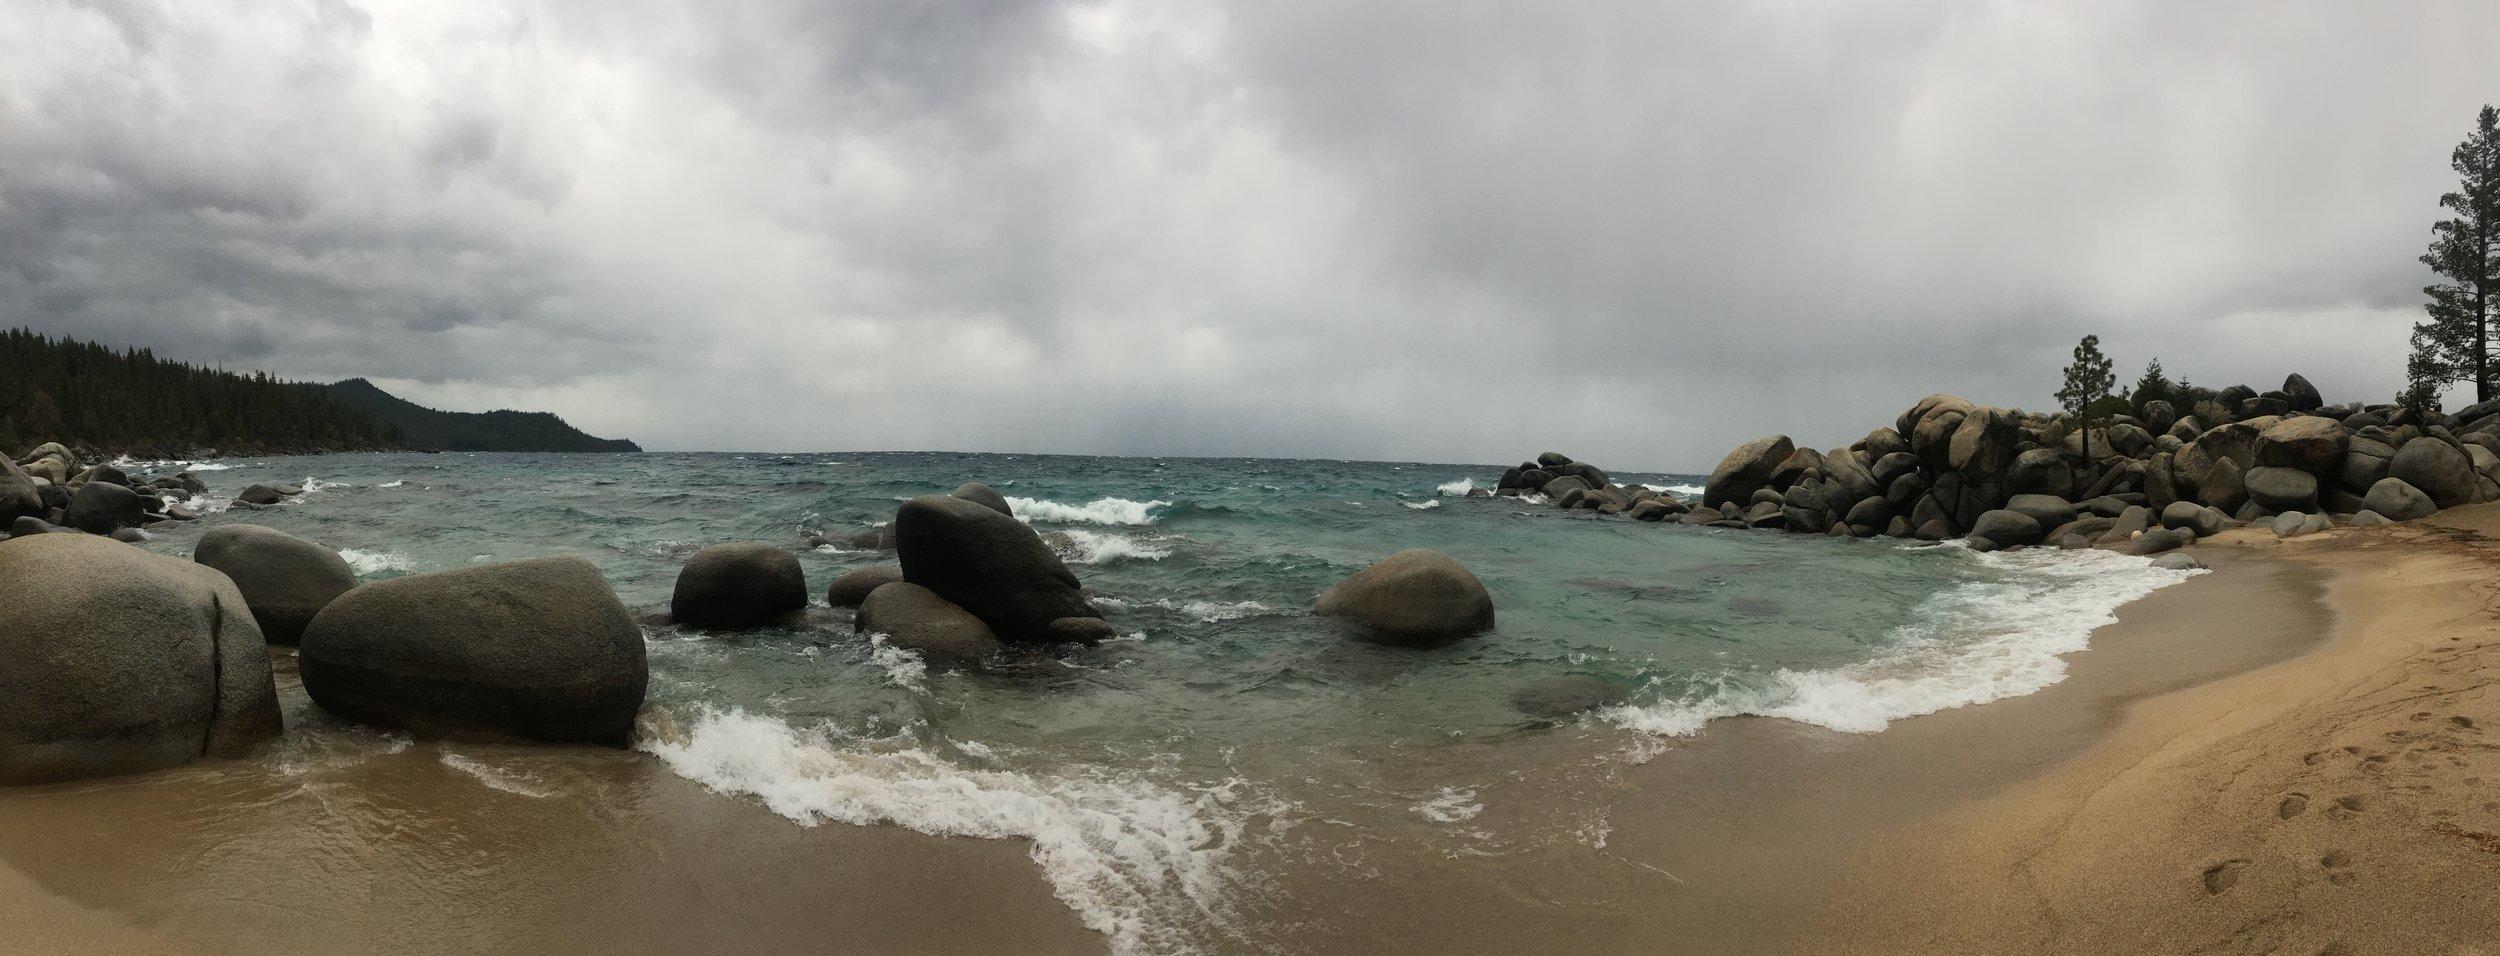 chimney-beach-family-friendly-tahoe-beaches